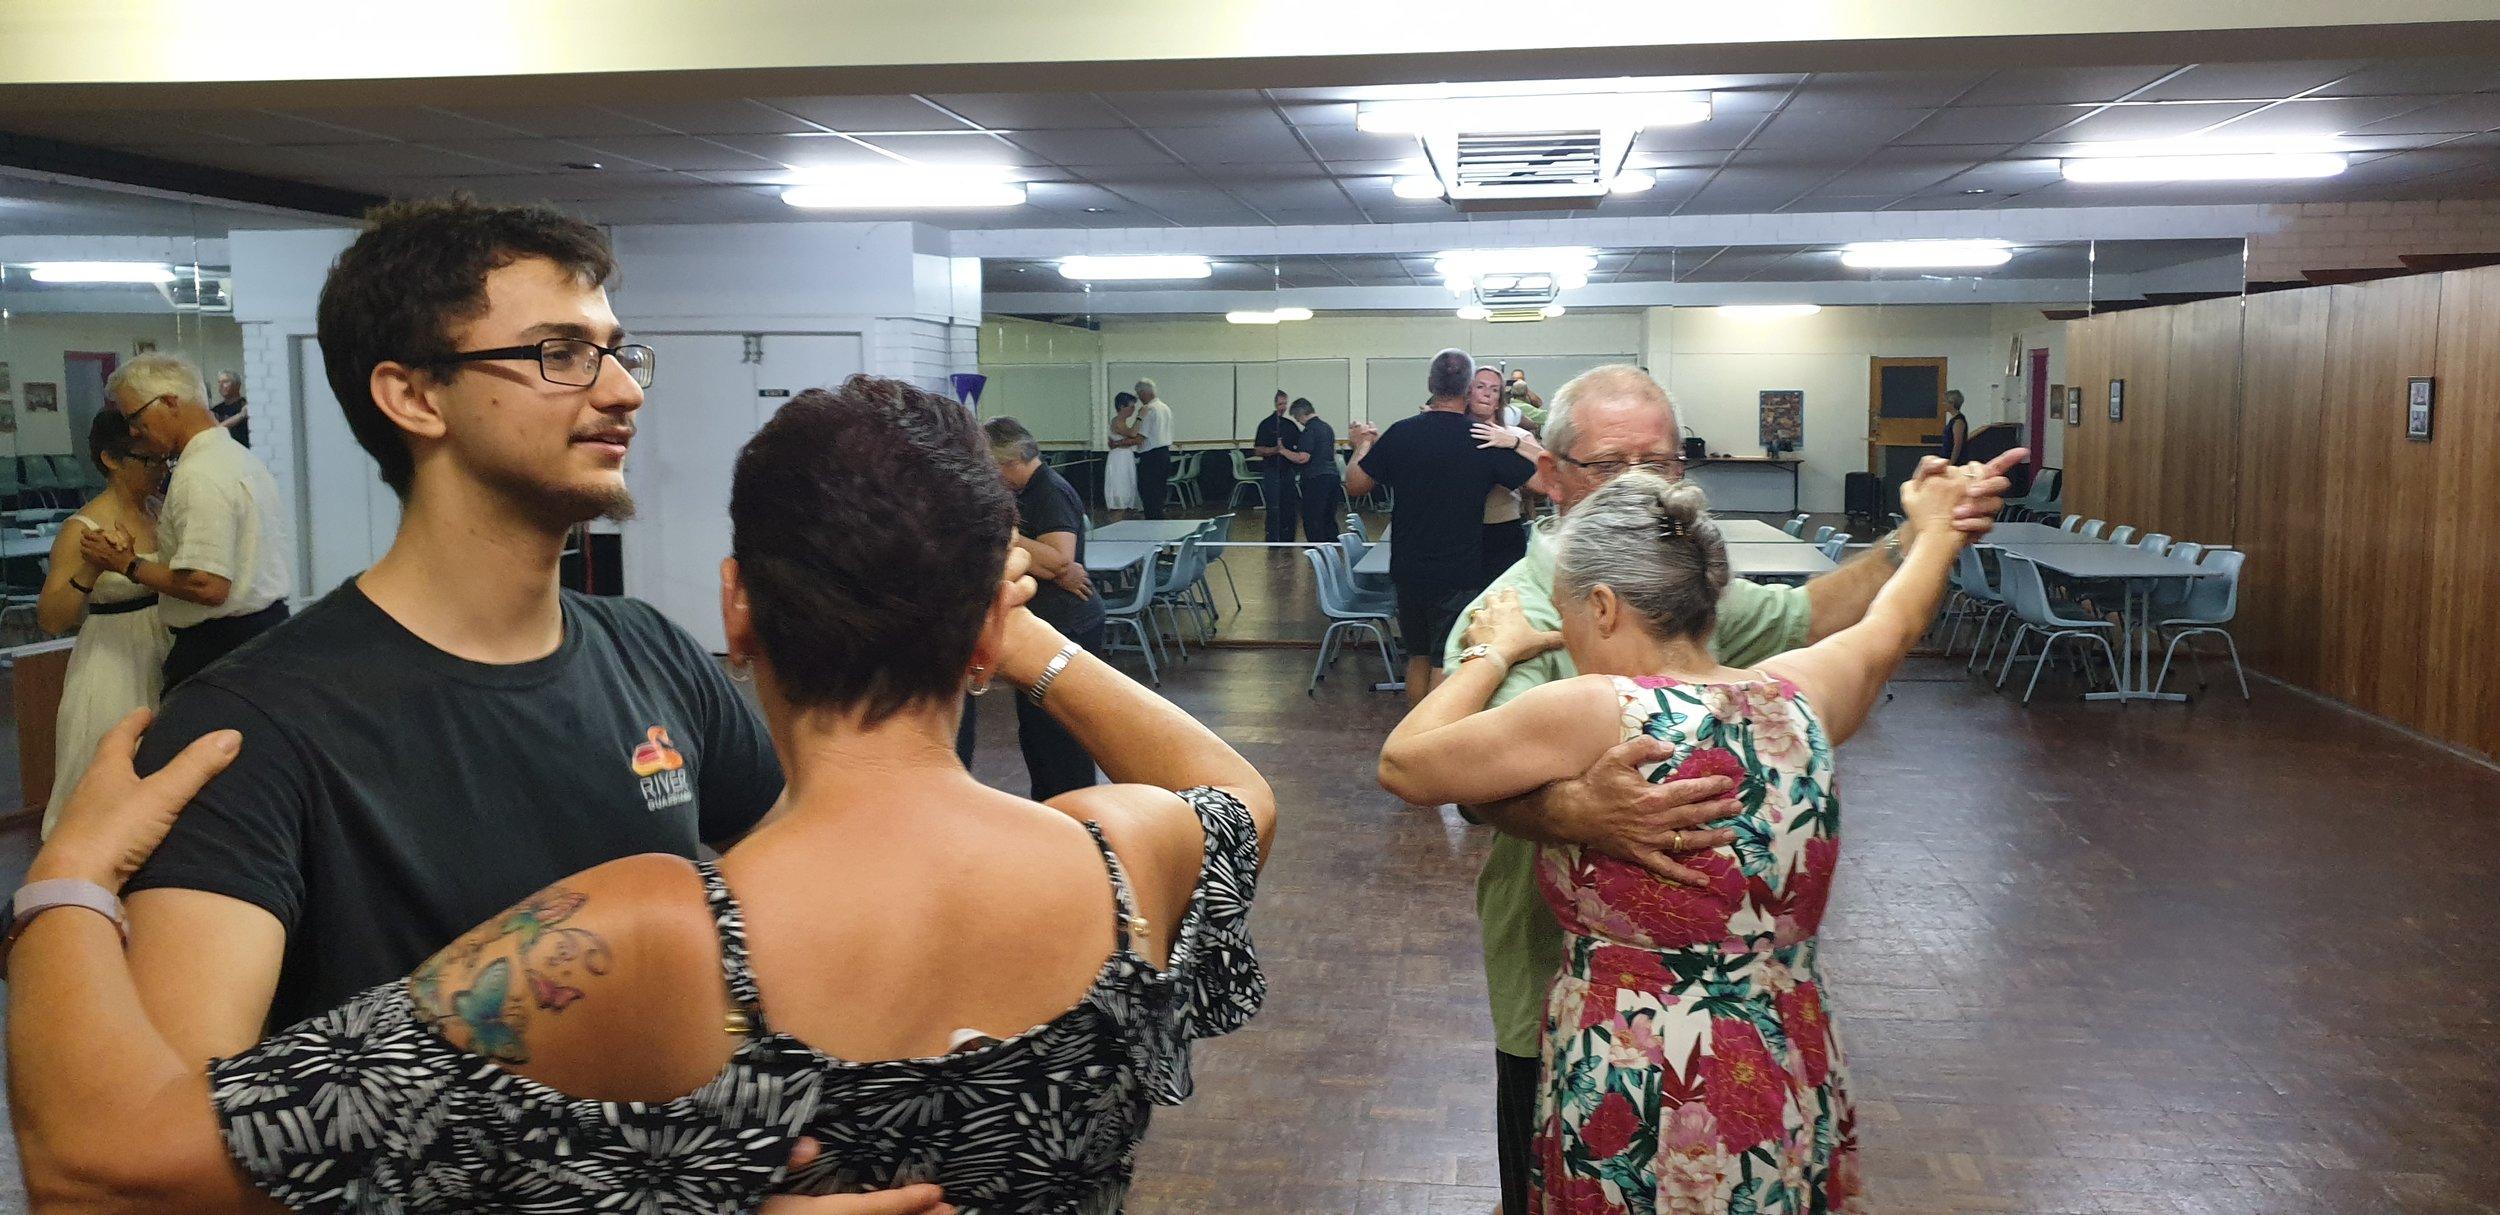 chisholm dance_adult beginners dance classes_wangarra(1).jpg